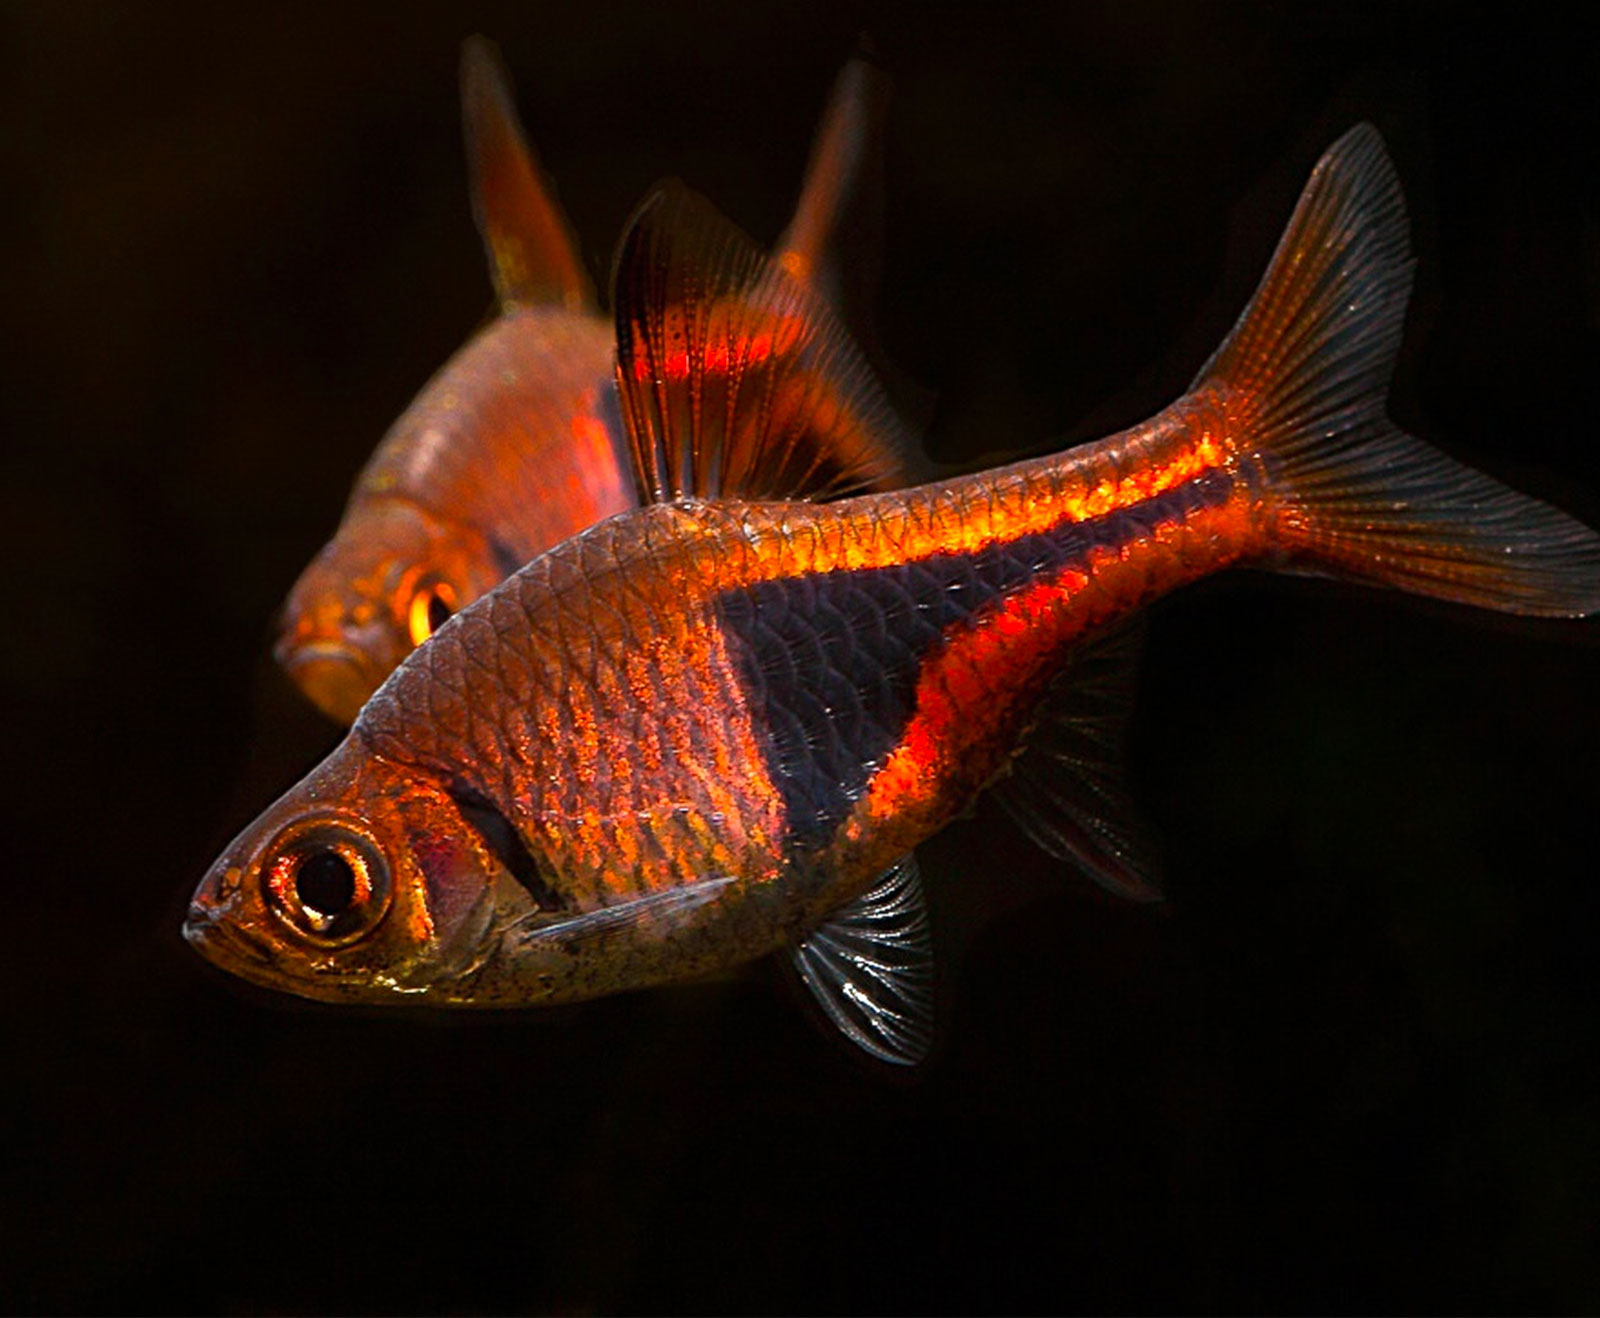 Rasbora heteromorpha acquista online pesci tropicali for Pesci online